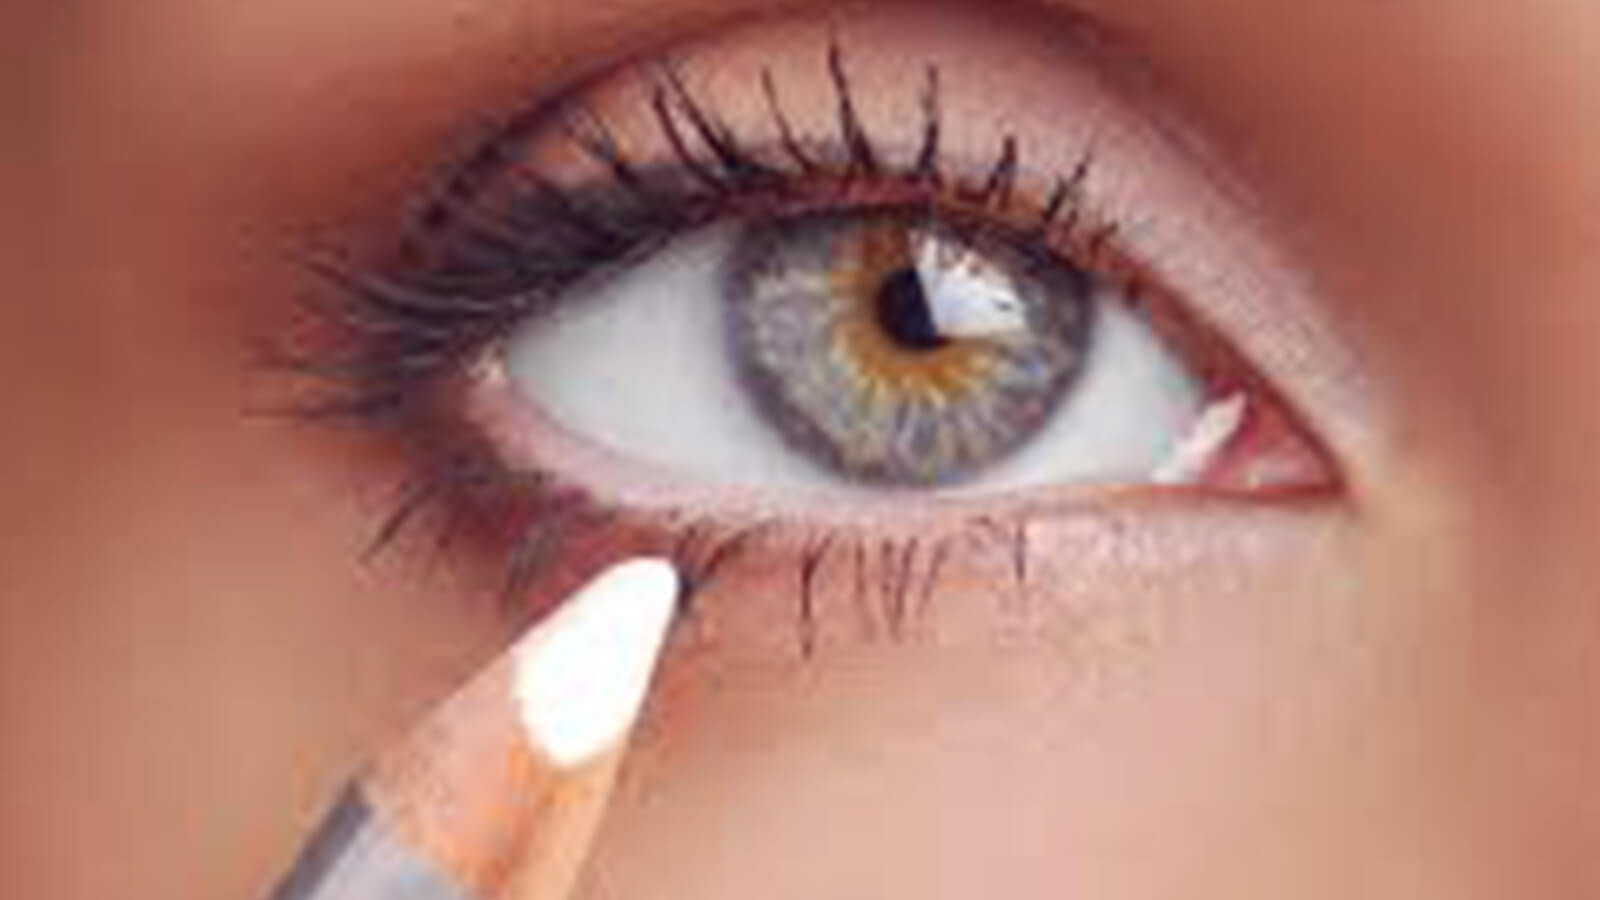 Using white eyeliner